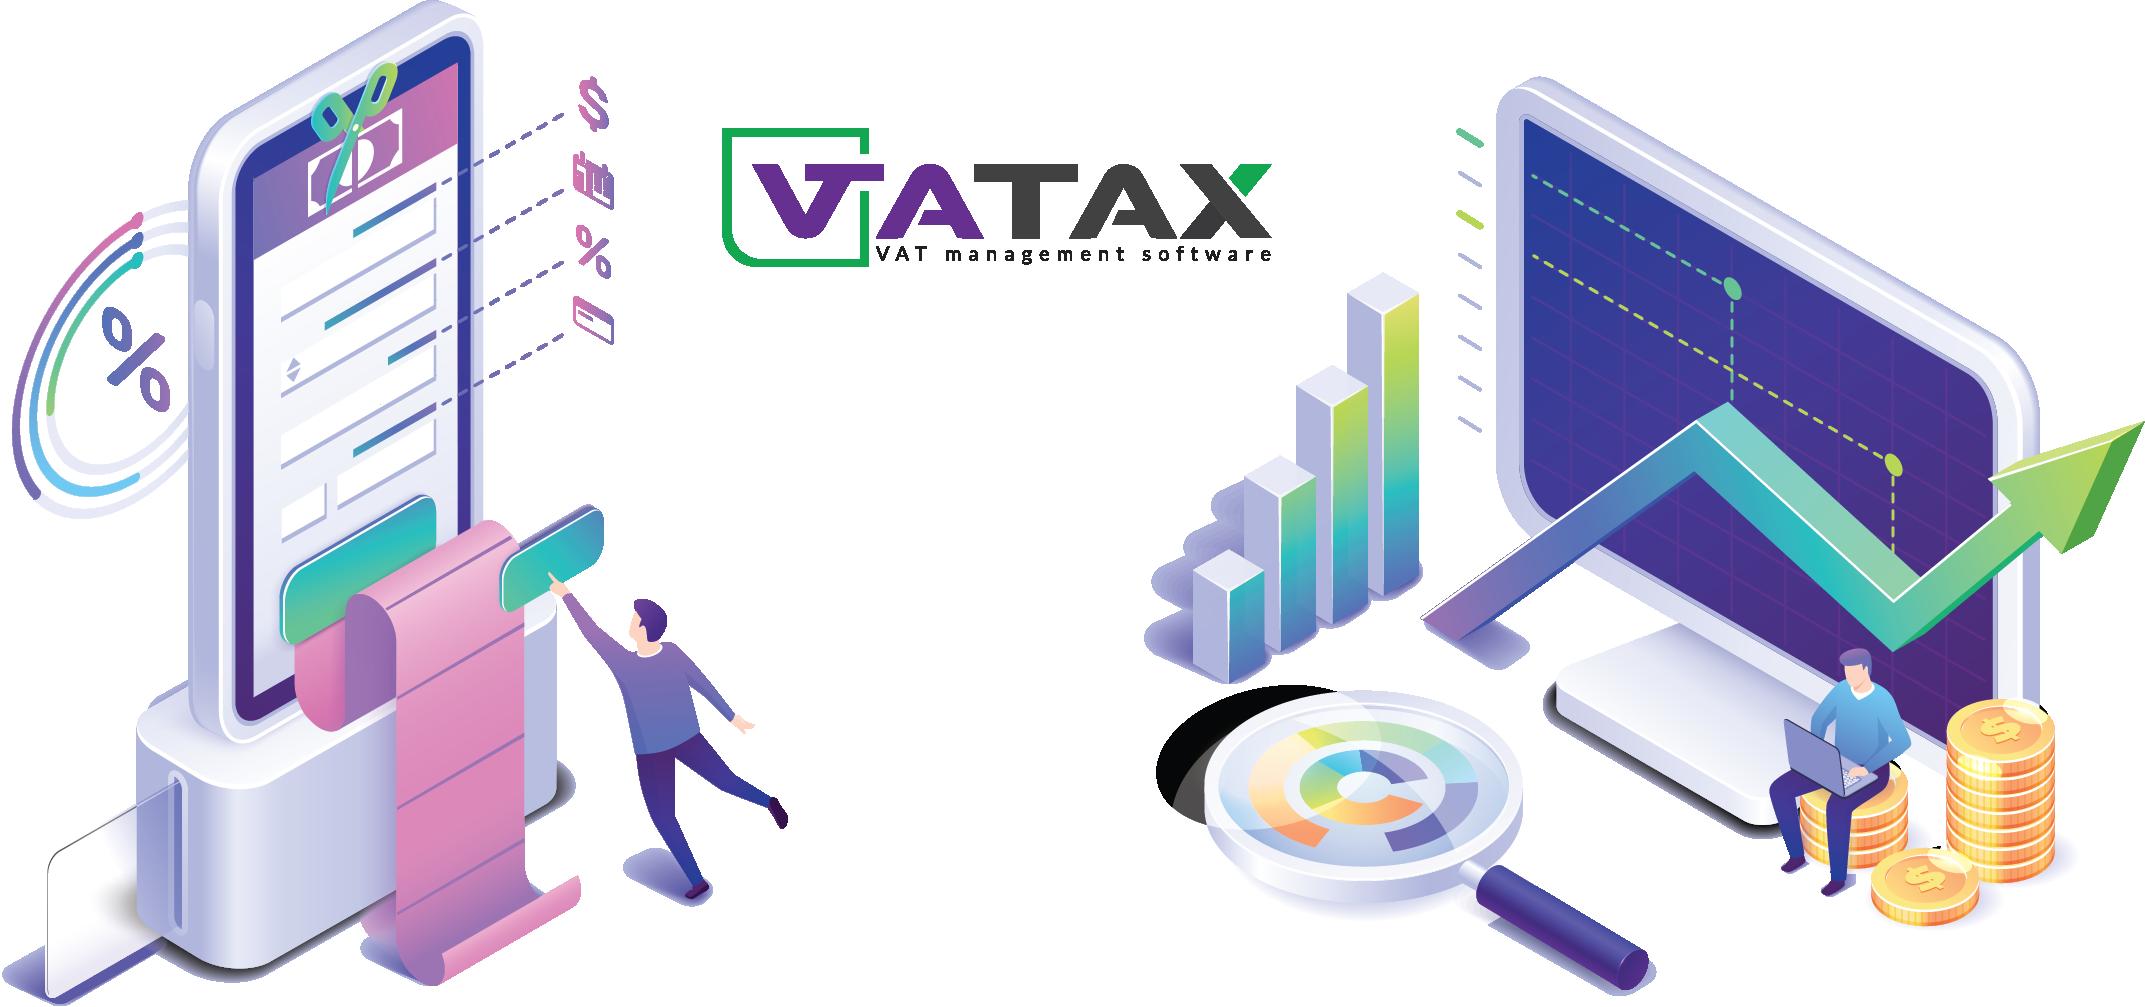 vat management software Vatax skylark soft limited